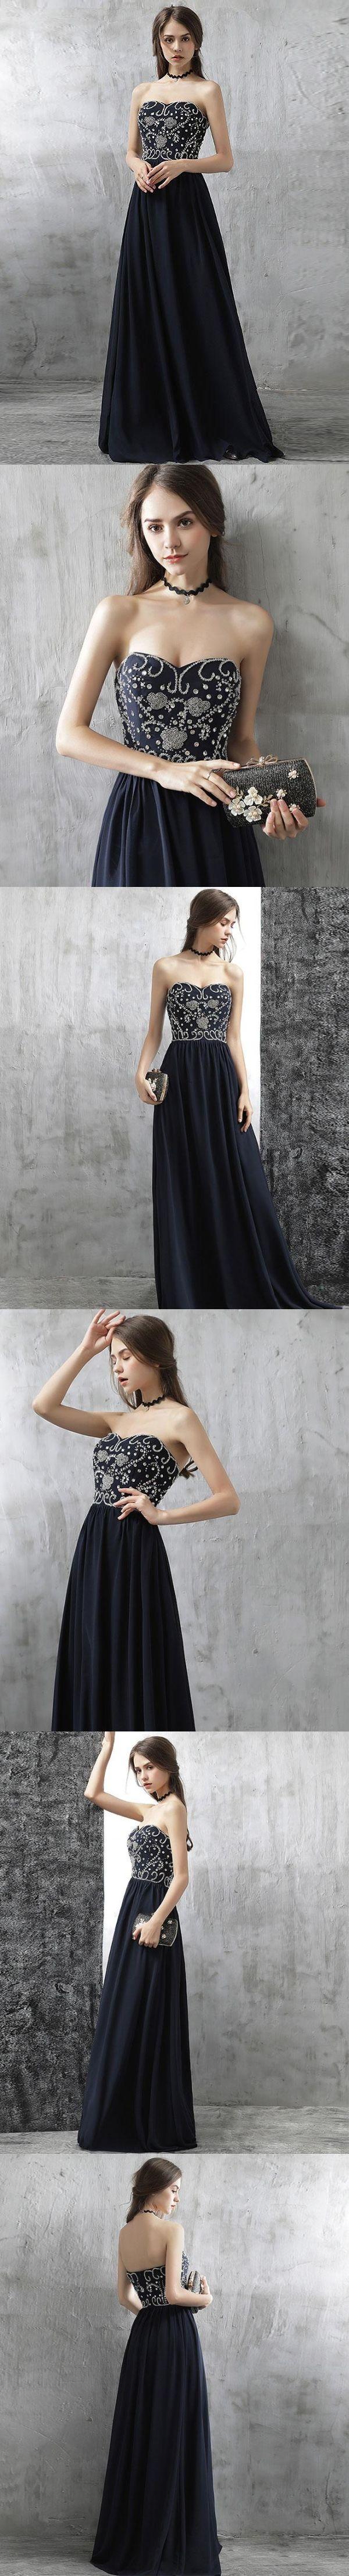 Simple prom dresses sweetheart floorlength dark navy chiffon sexy